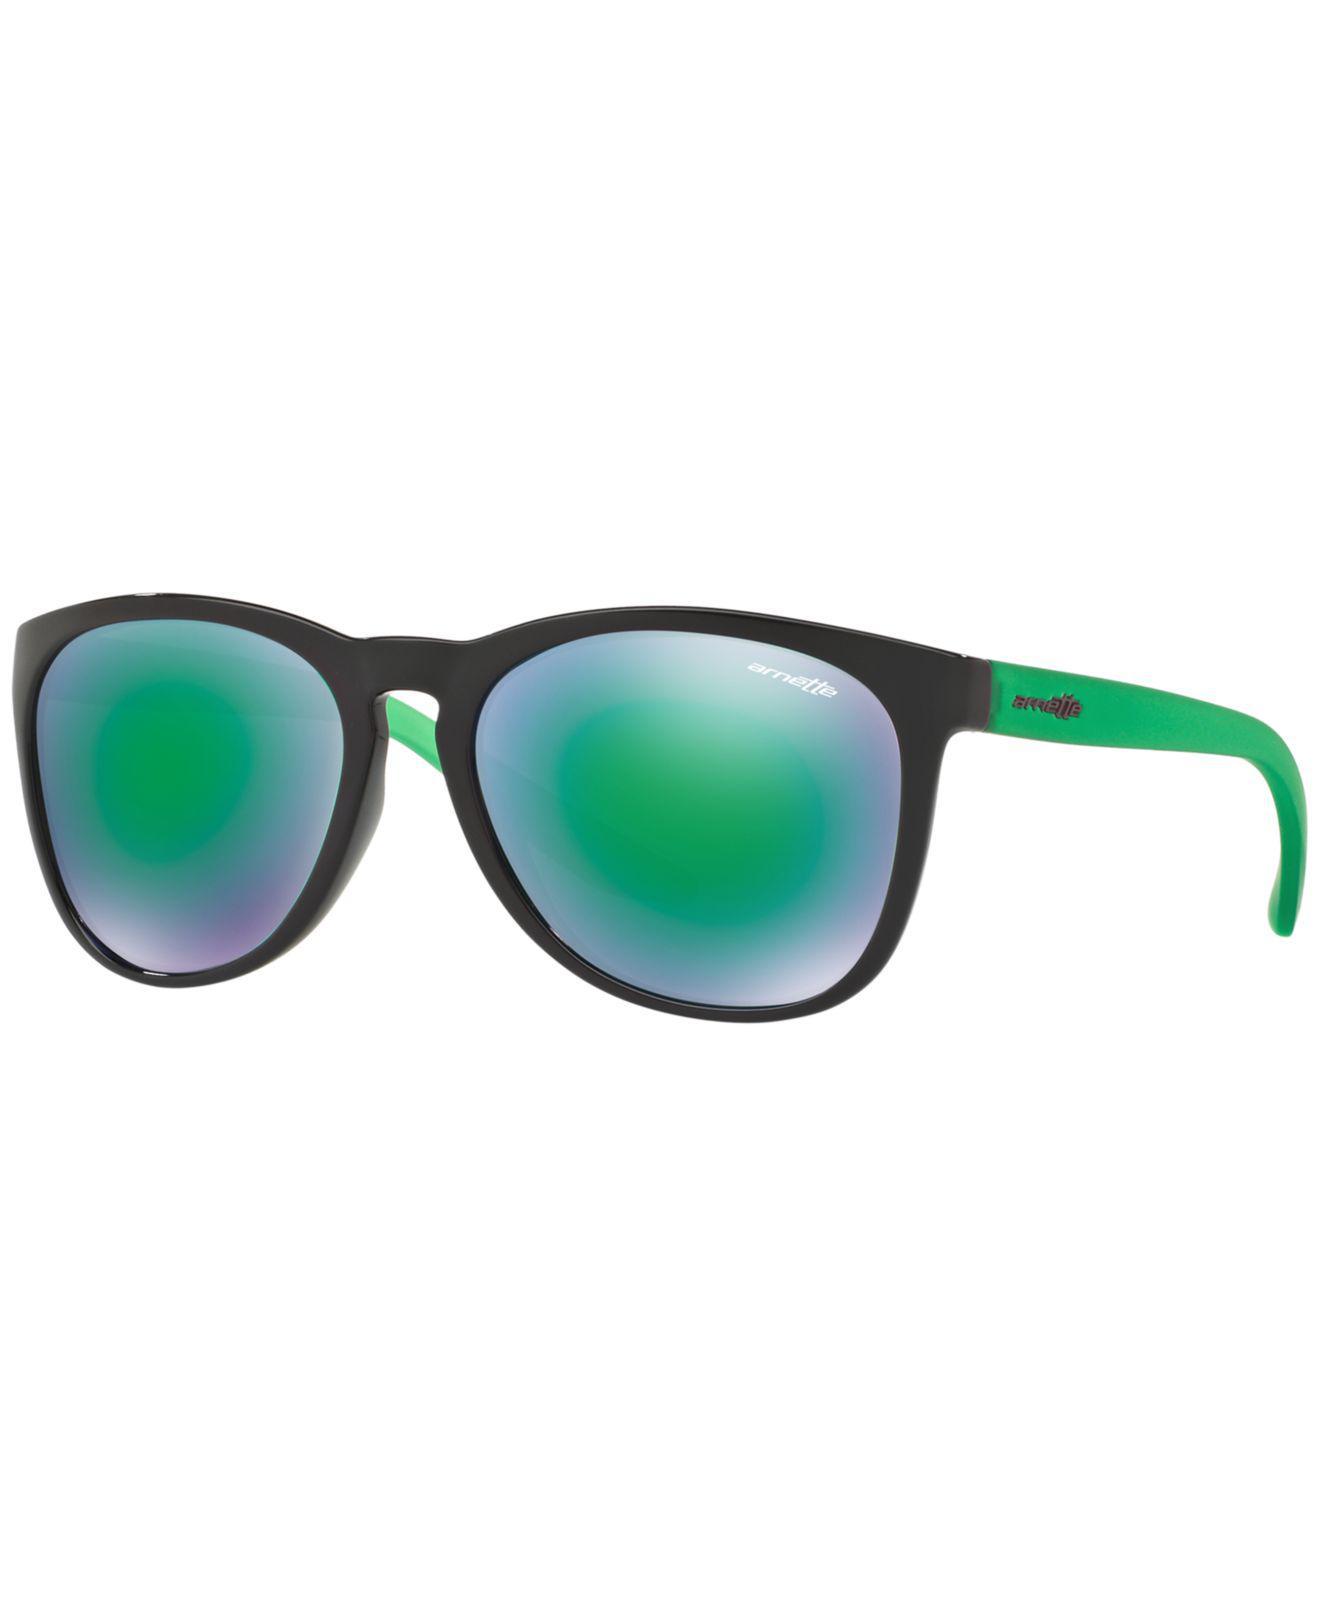 e3dd7a20144 Arnette. Women s Green Sunglasses ...